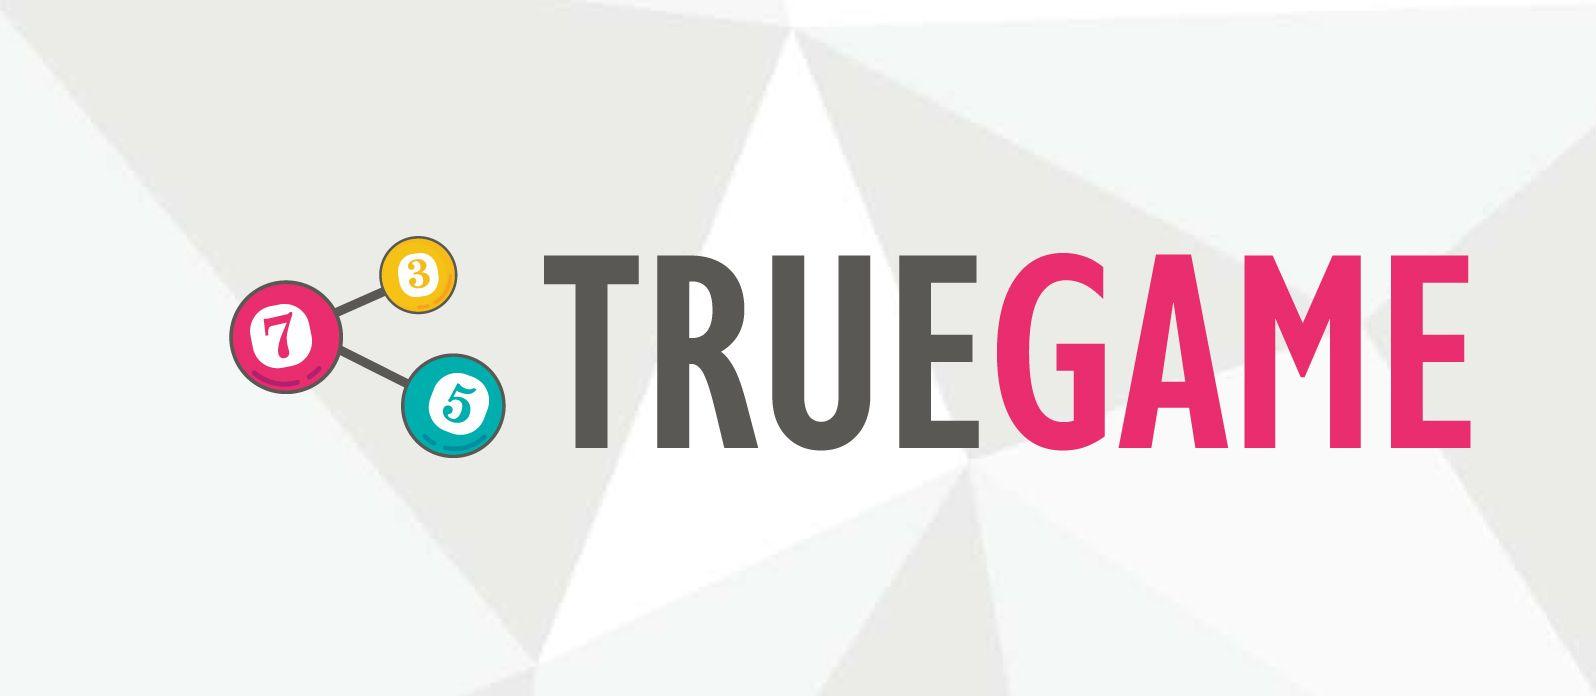 55b5c-truegame.jpg